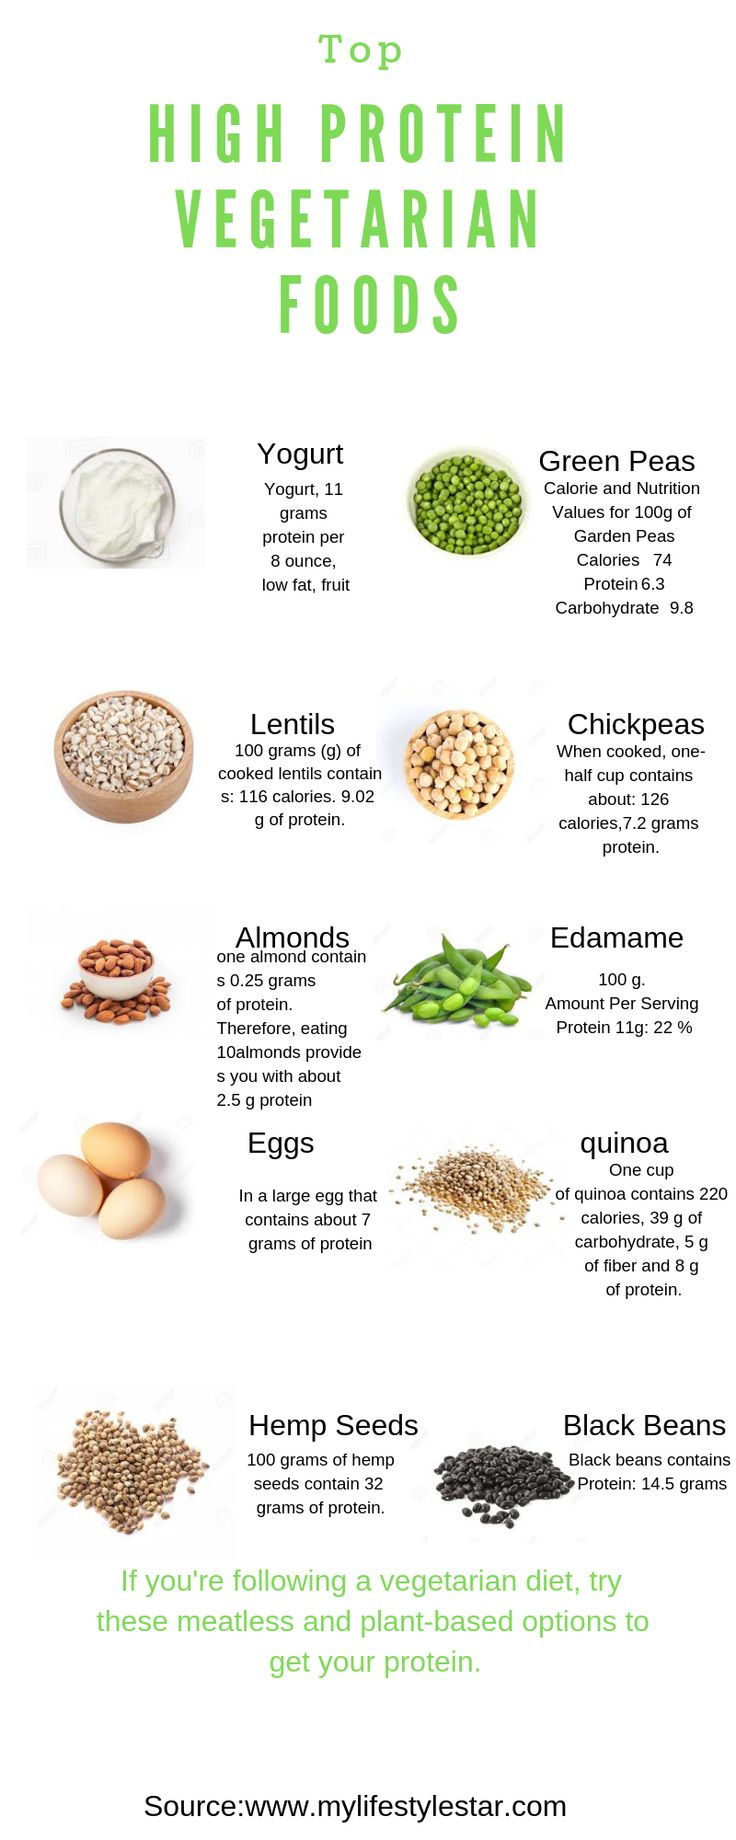 Top High Protein Vegetarian Foods List High Protein Vegetarian Recipes Vegetarian Food List Vegetarian